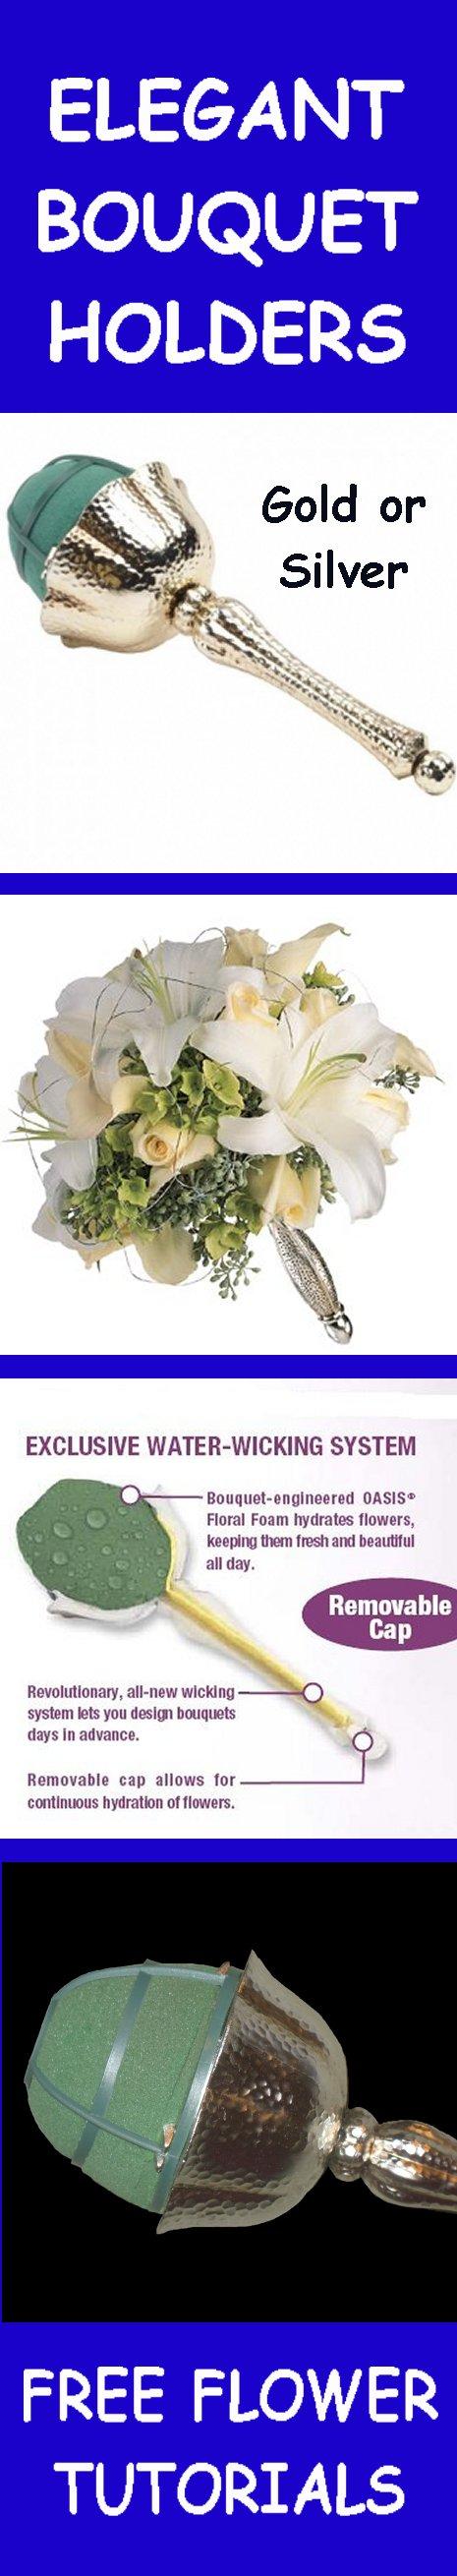 Elegant bridal bouquet holders easy step by step wedding flower free flower tutorials izmirmasajfo